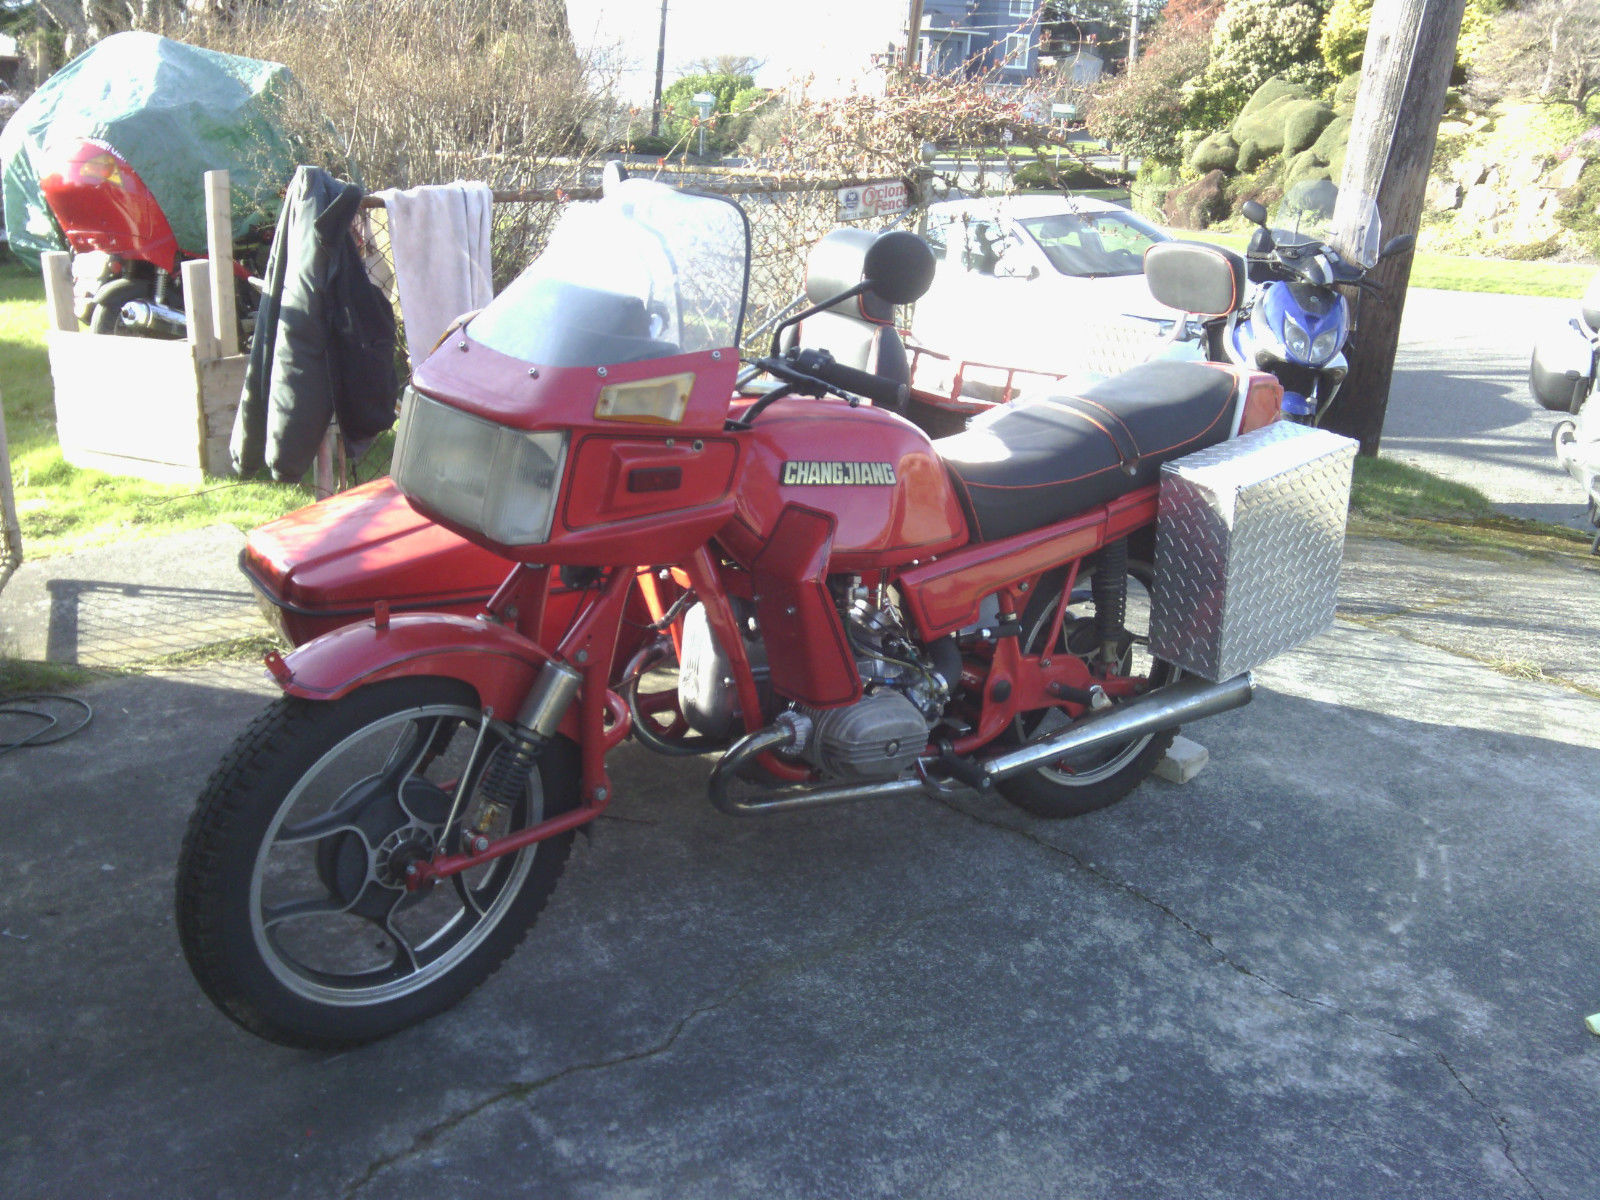 Chang Jiang CJ750 sidecar vintage military motorcycle motorbike T shirt